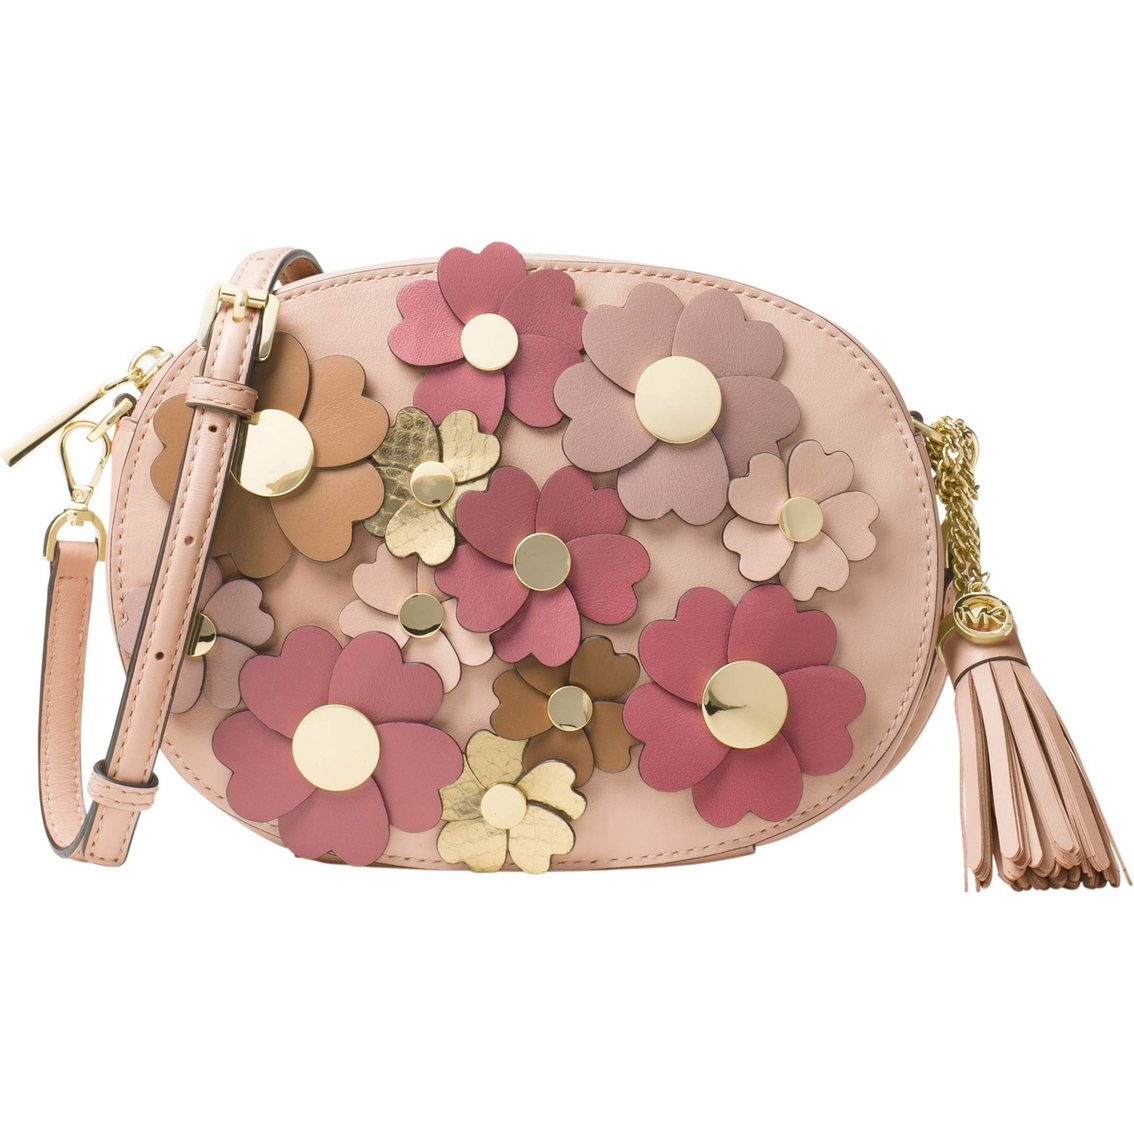 6dad25e252f8 Michael Kors Floral Applique Ginny Medium Messenger | Handbags ...